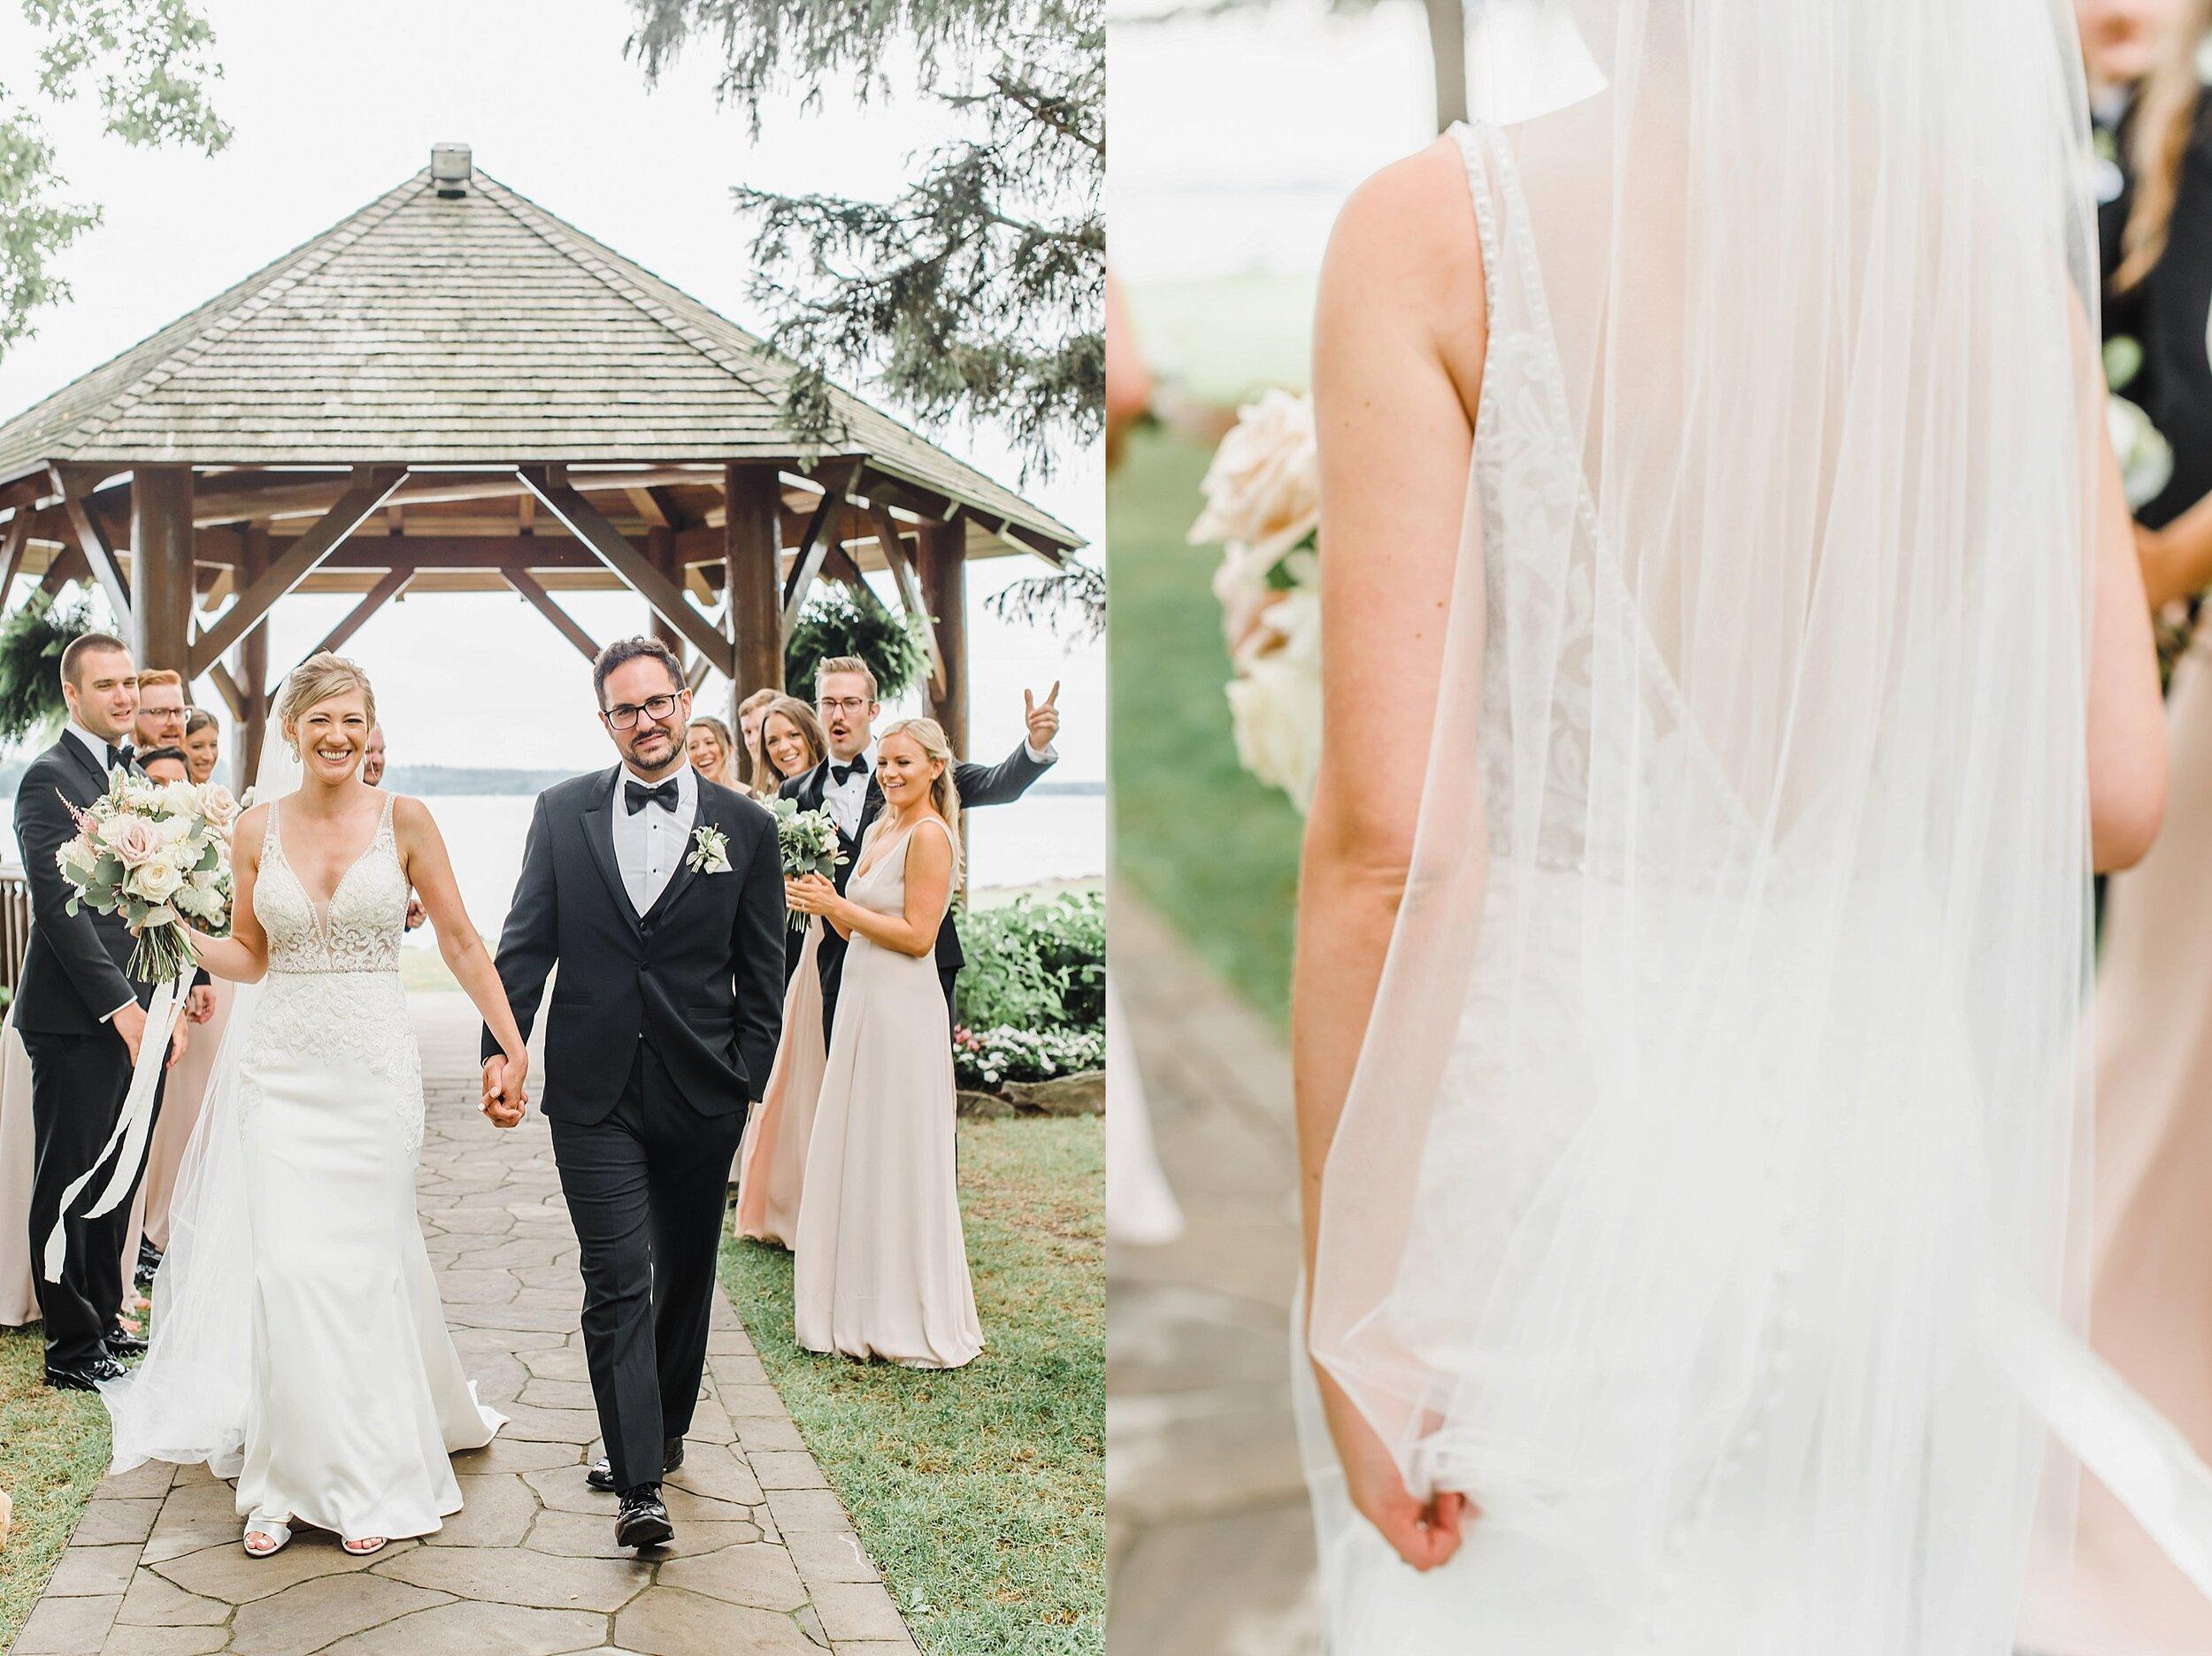 light airy fine art ottawa wedding photographer | Ali and Batoul Photography | Fairmont Le Chateau Montebello46.jpg